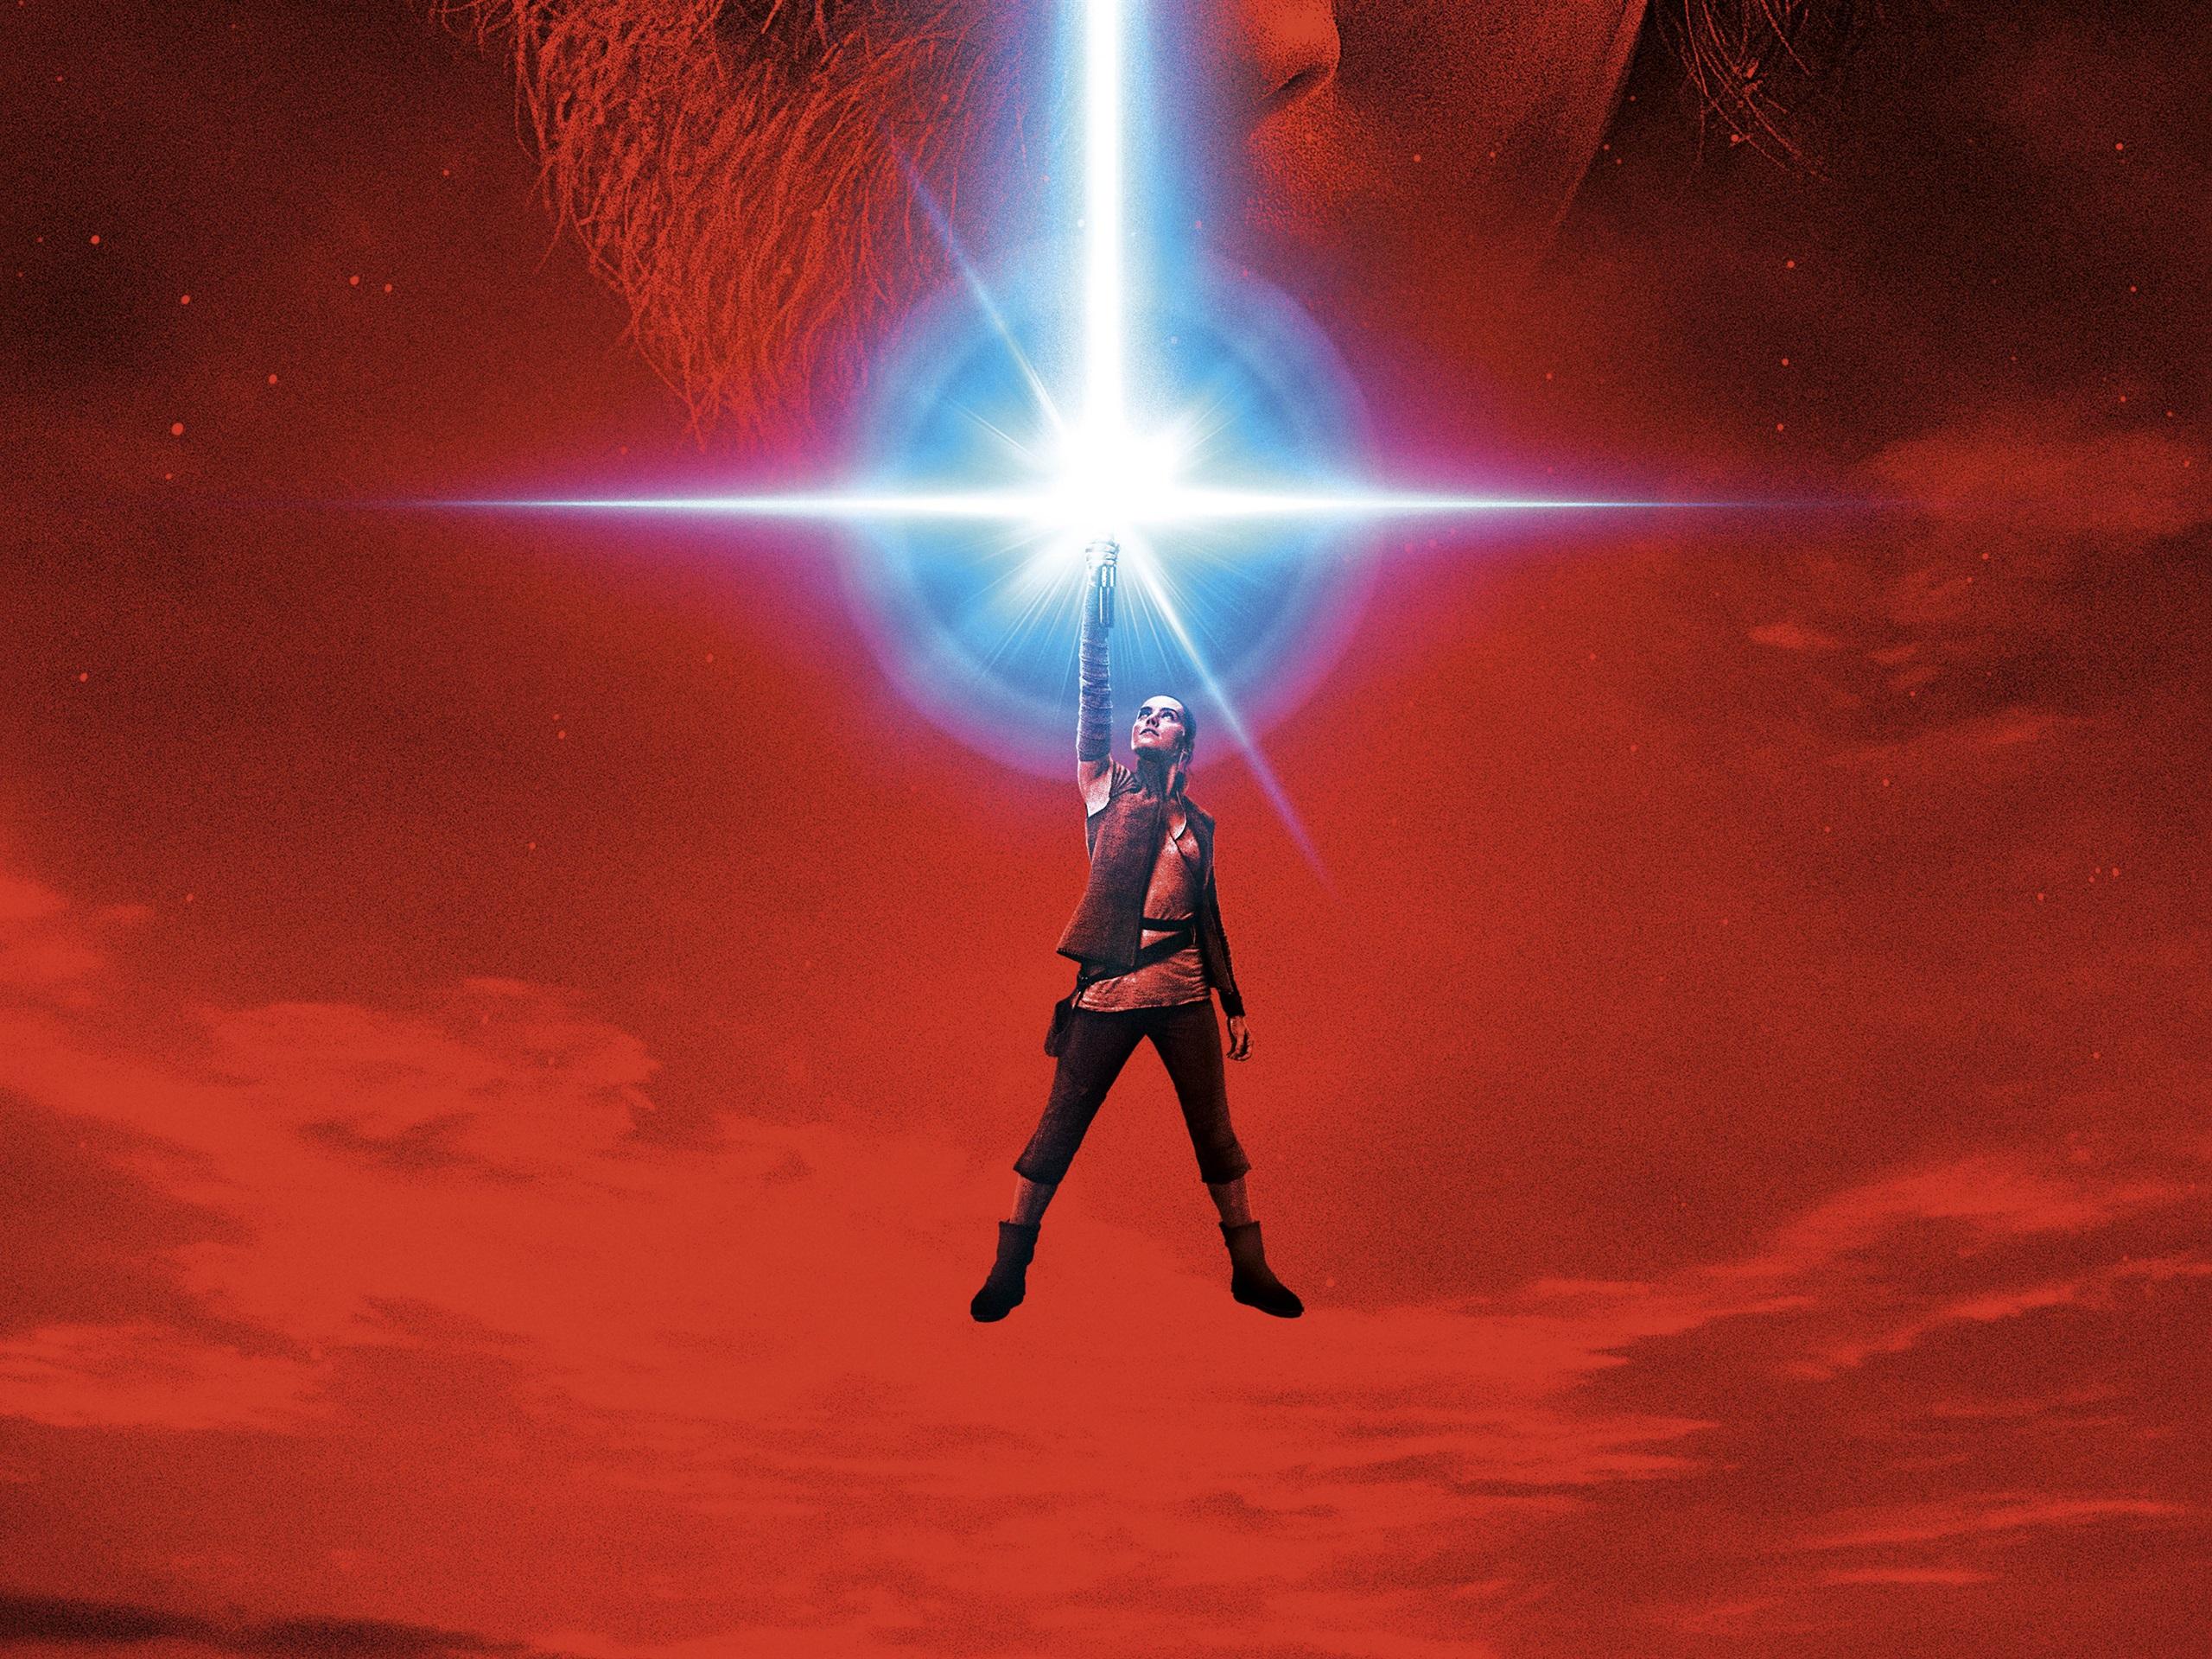 Wallpaper Star Wars The Last Jedi 3840x2160 Uhd 4k Picture Image